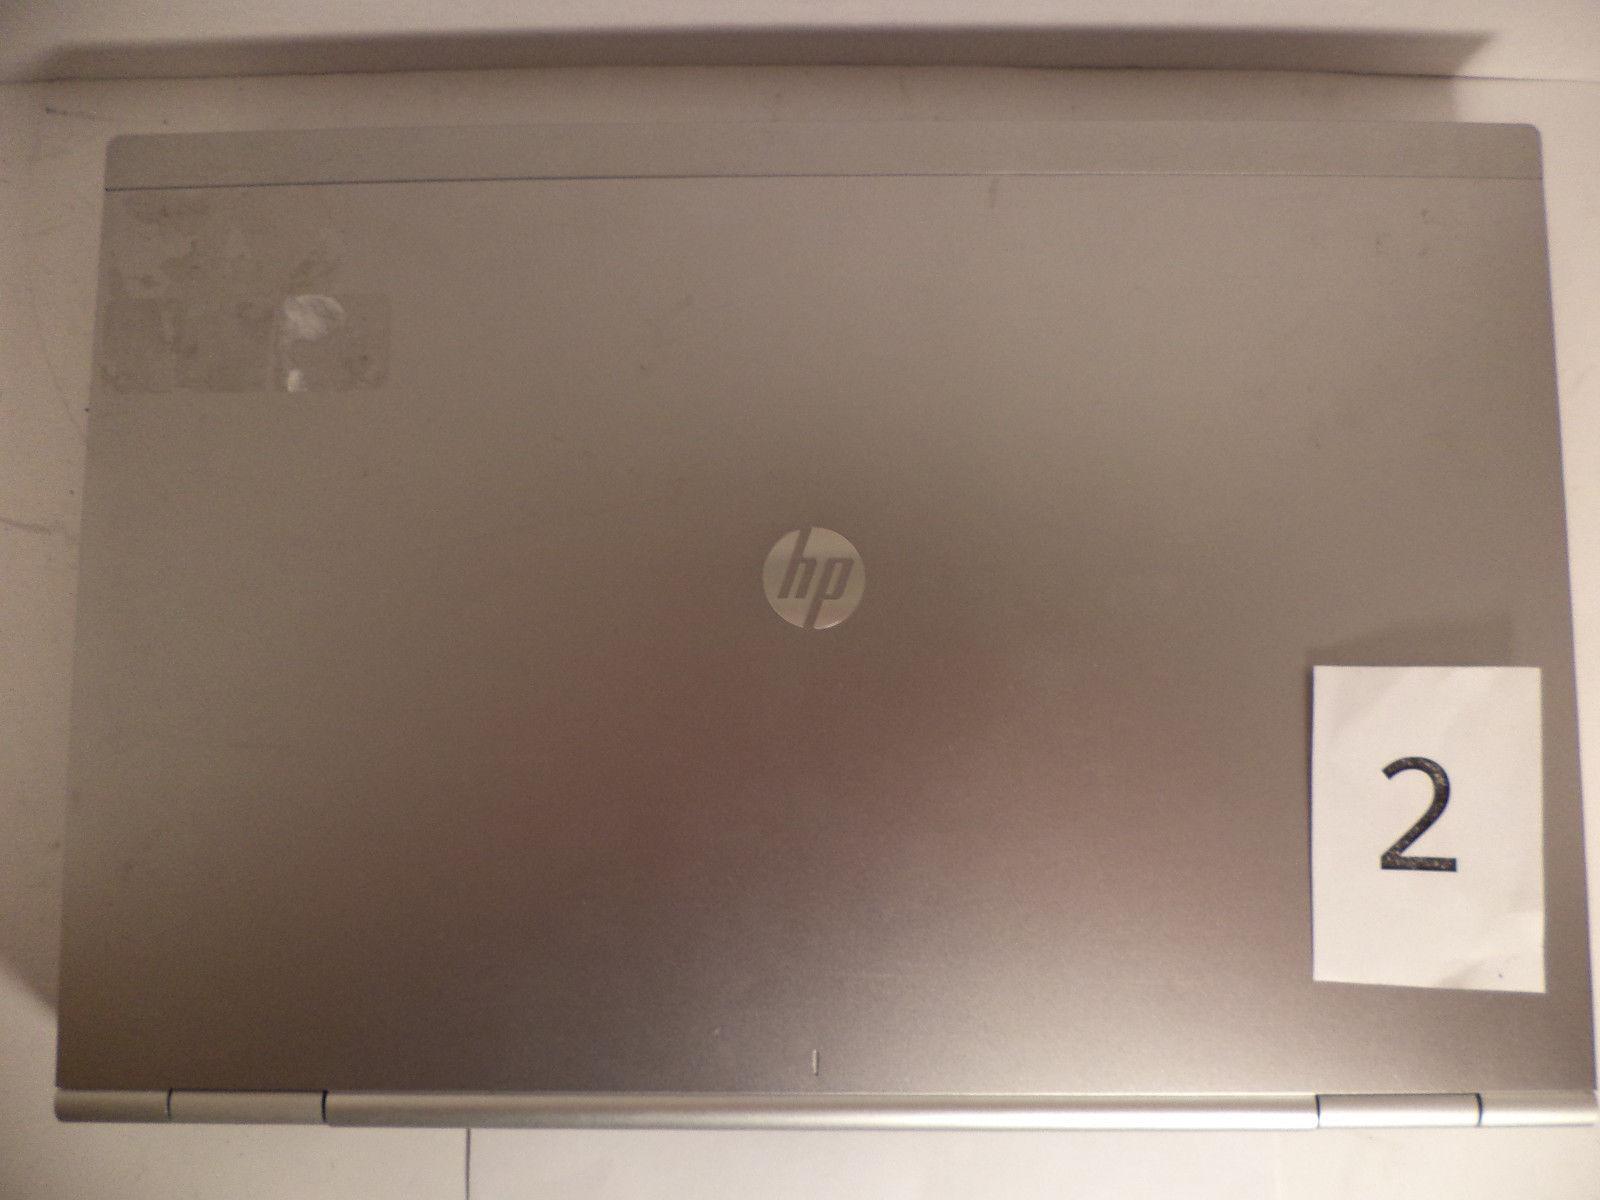 HP Compaq EliteBook 8570p i7 CPU Laptop 2 GB RAM No Hard Drive No OS Lot 3 AS-IS